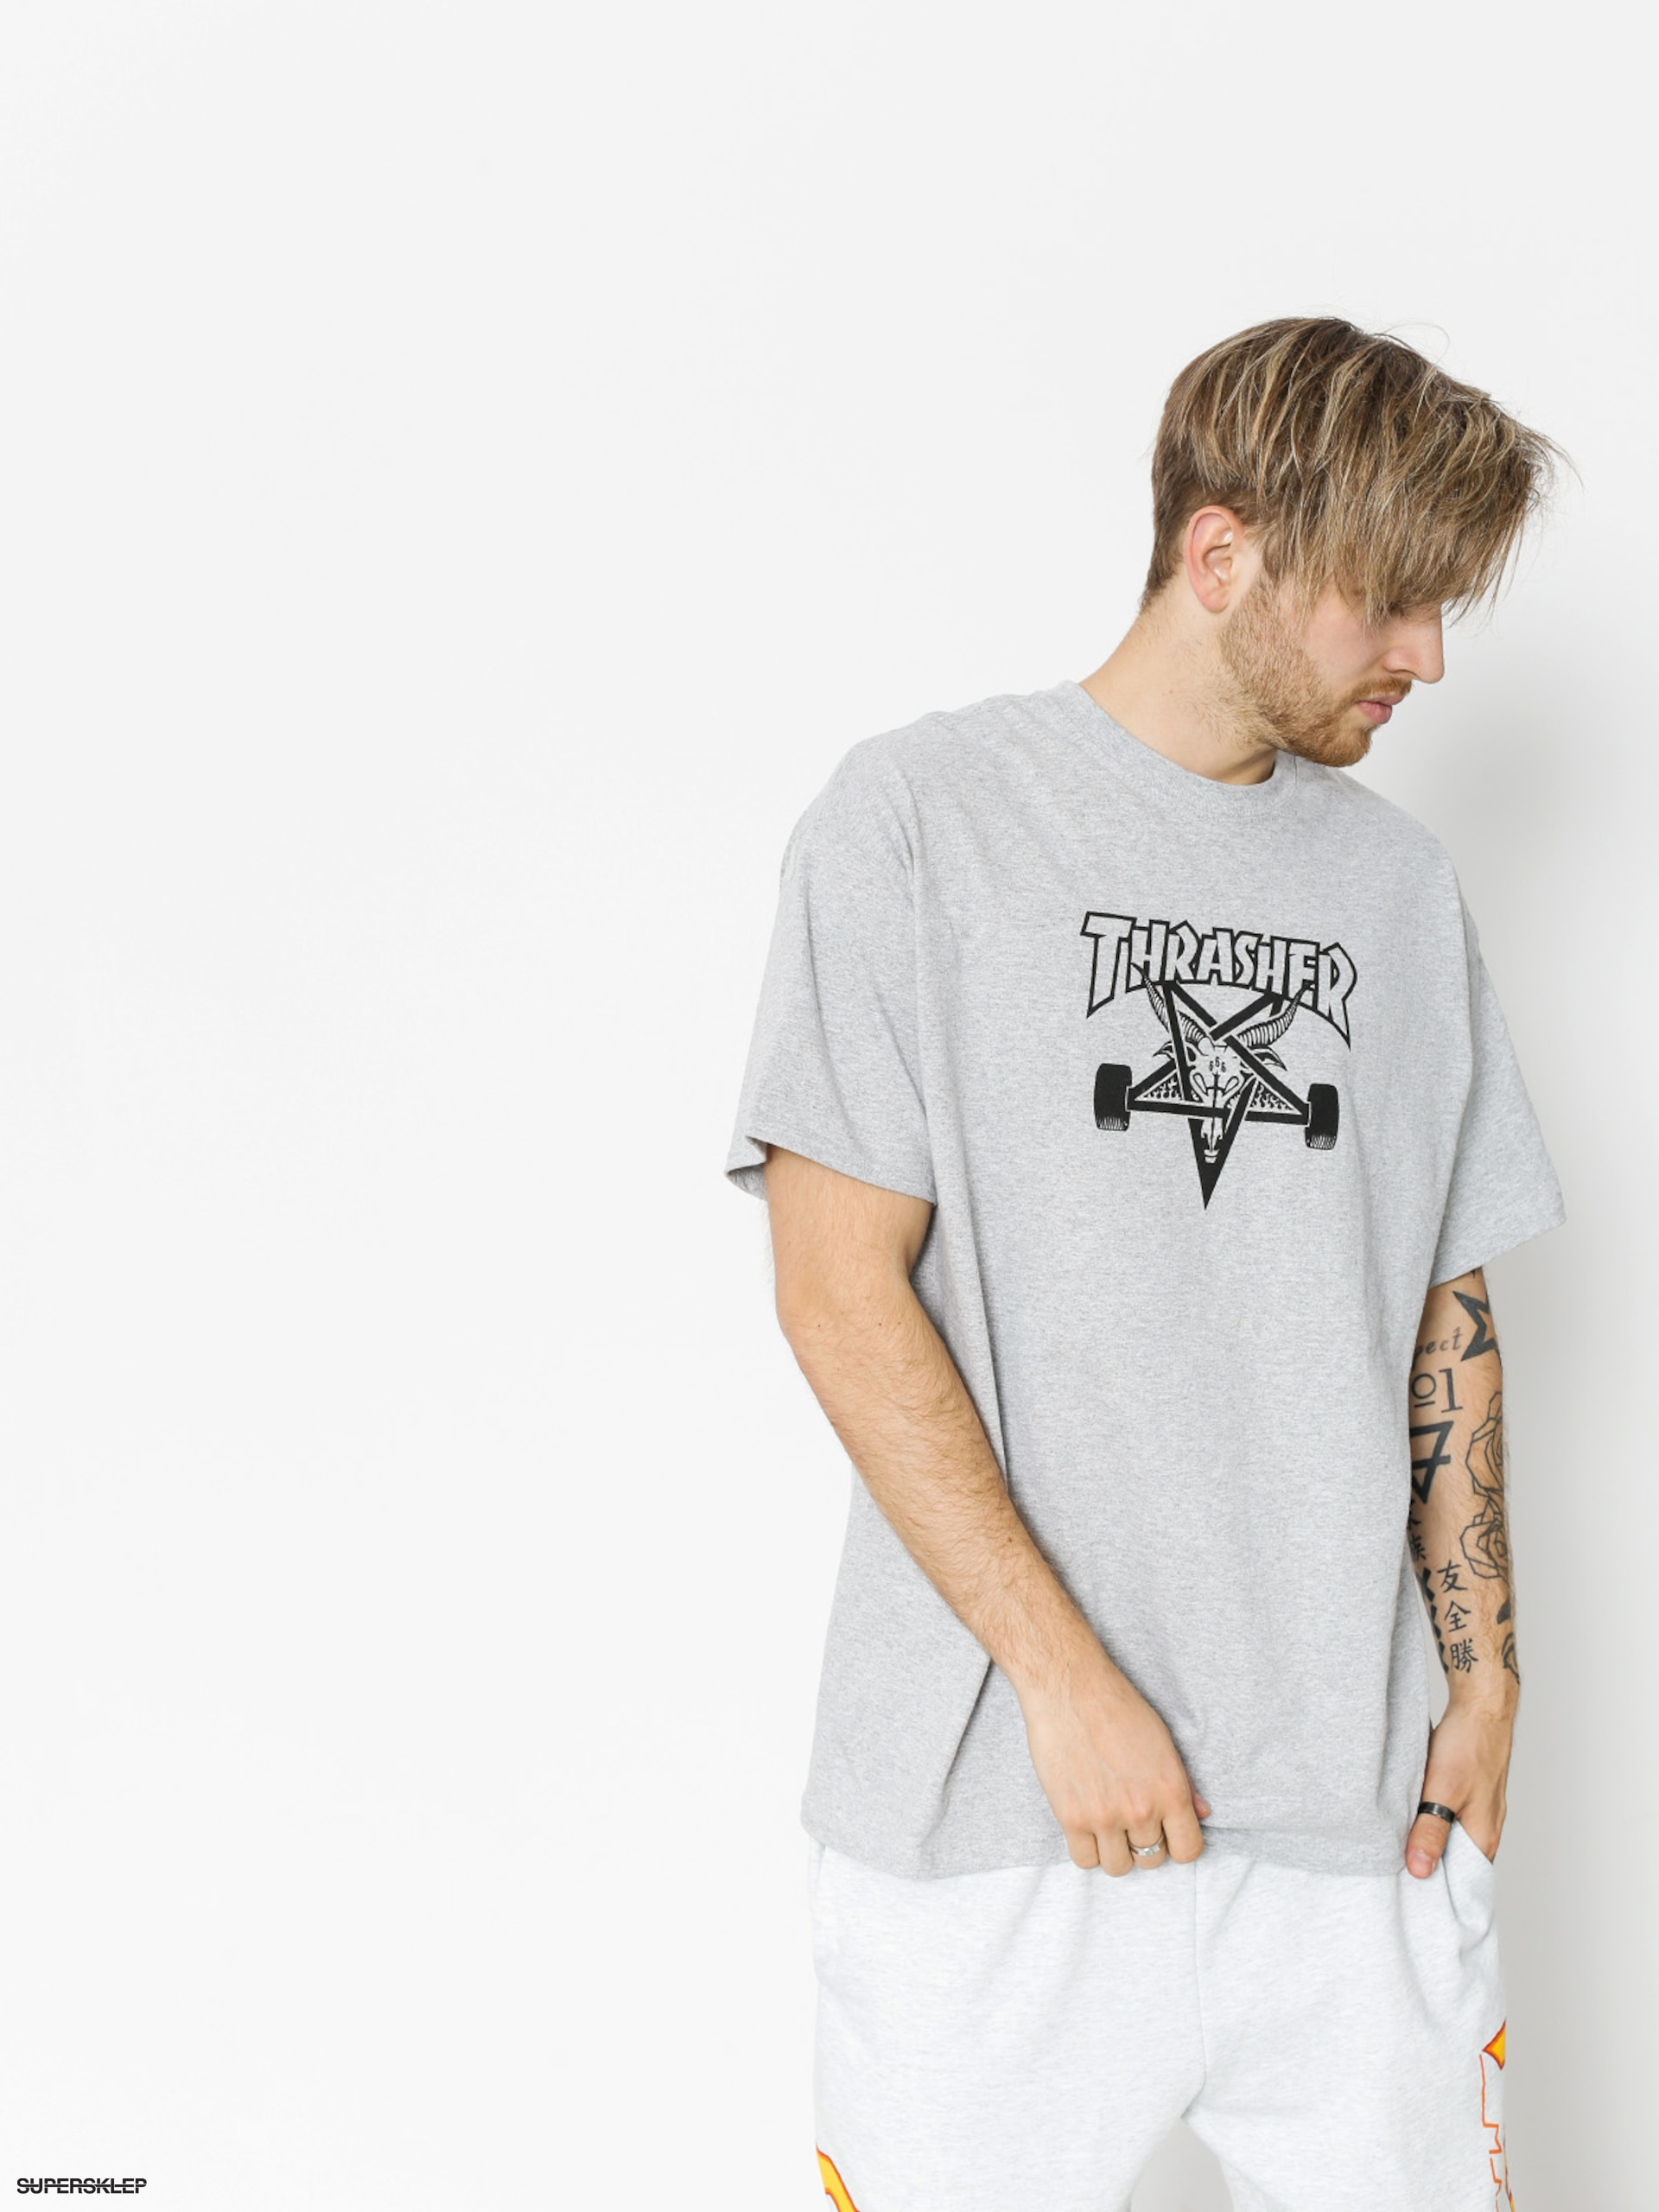 98a5349b38e4 T-shirt Thrasher Skategoat (grey)